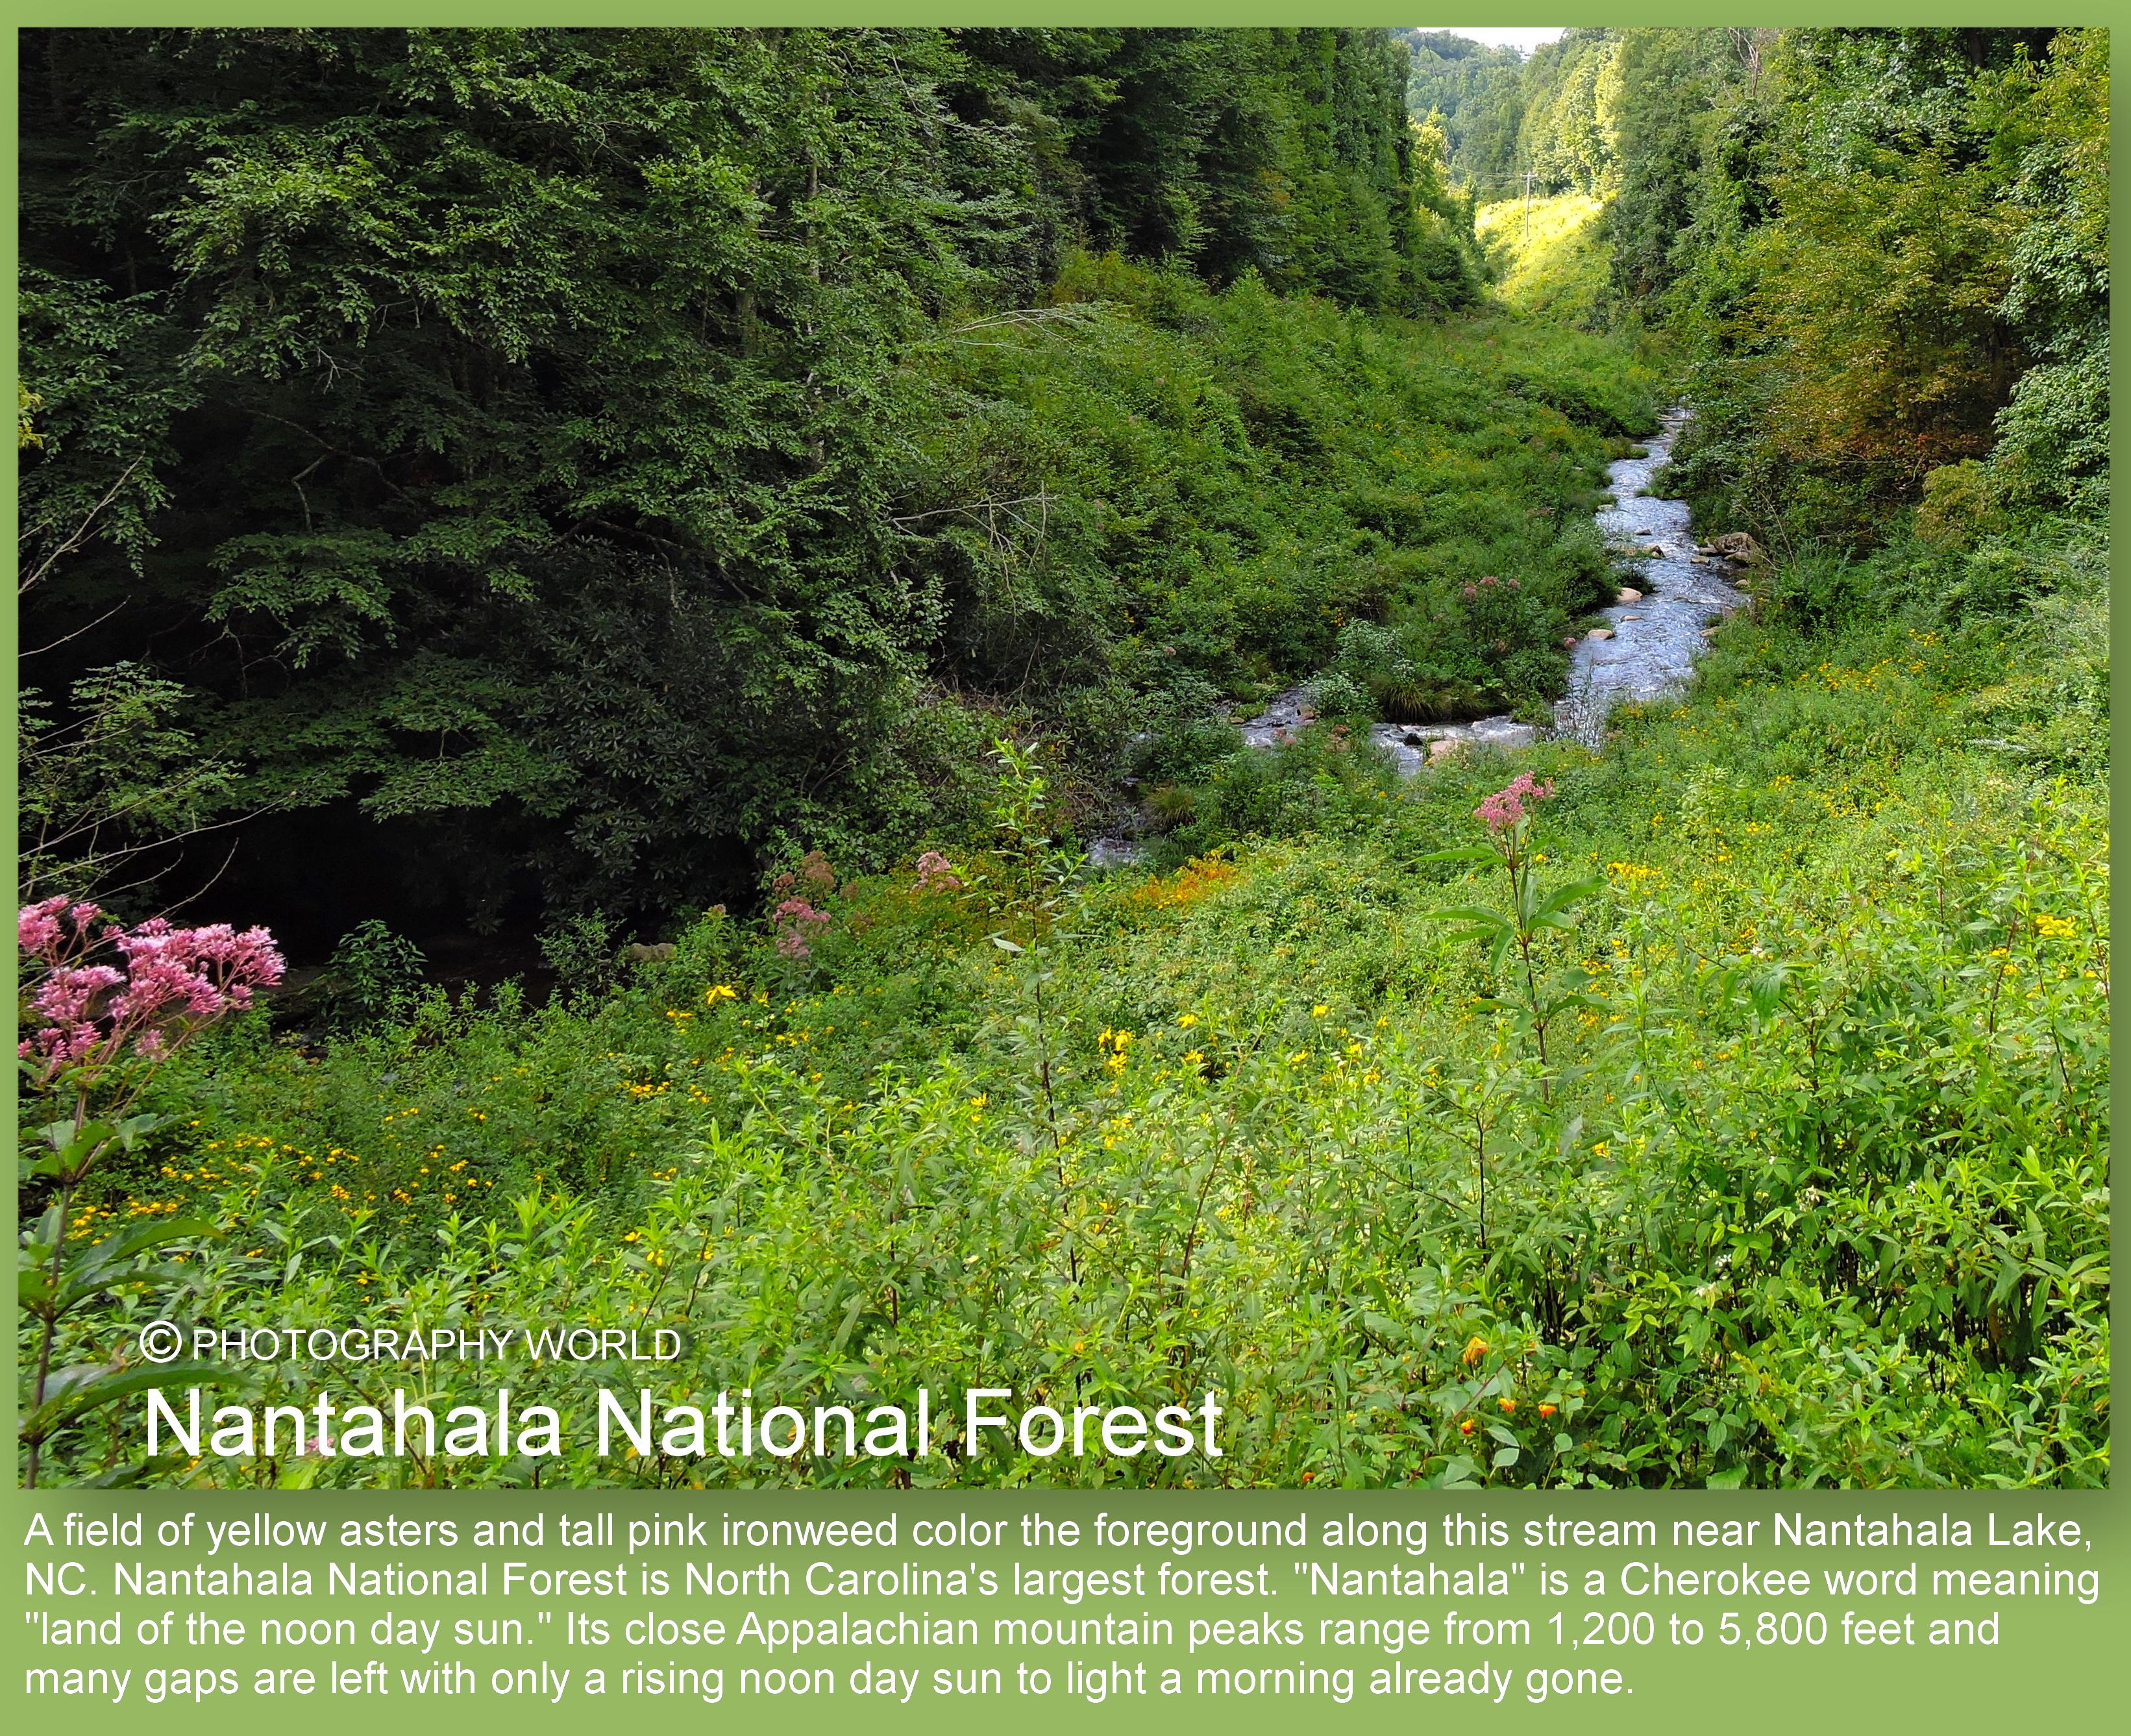 "© Nantahala National Forest text for PHOTOGRAPHY WORLD. Photograph by Mina Thevenin. Photography World article: ""APPALACHIAN TRAIL|Take a Walk on the Wild Side|Nantahala|Tellico Gap to Wayah Bald"" photographyworld.org"